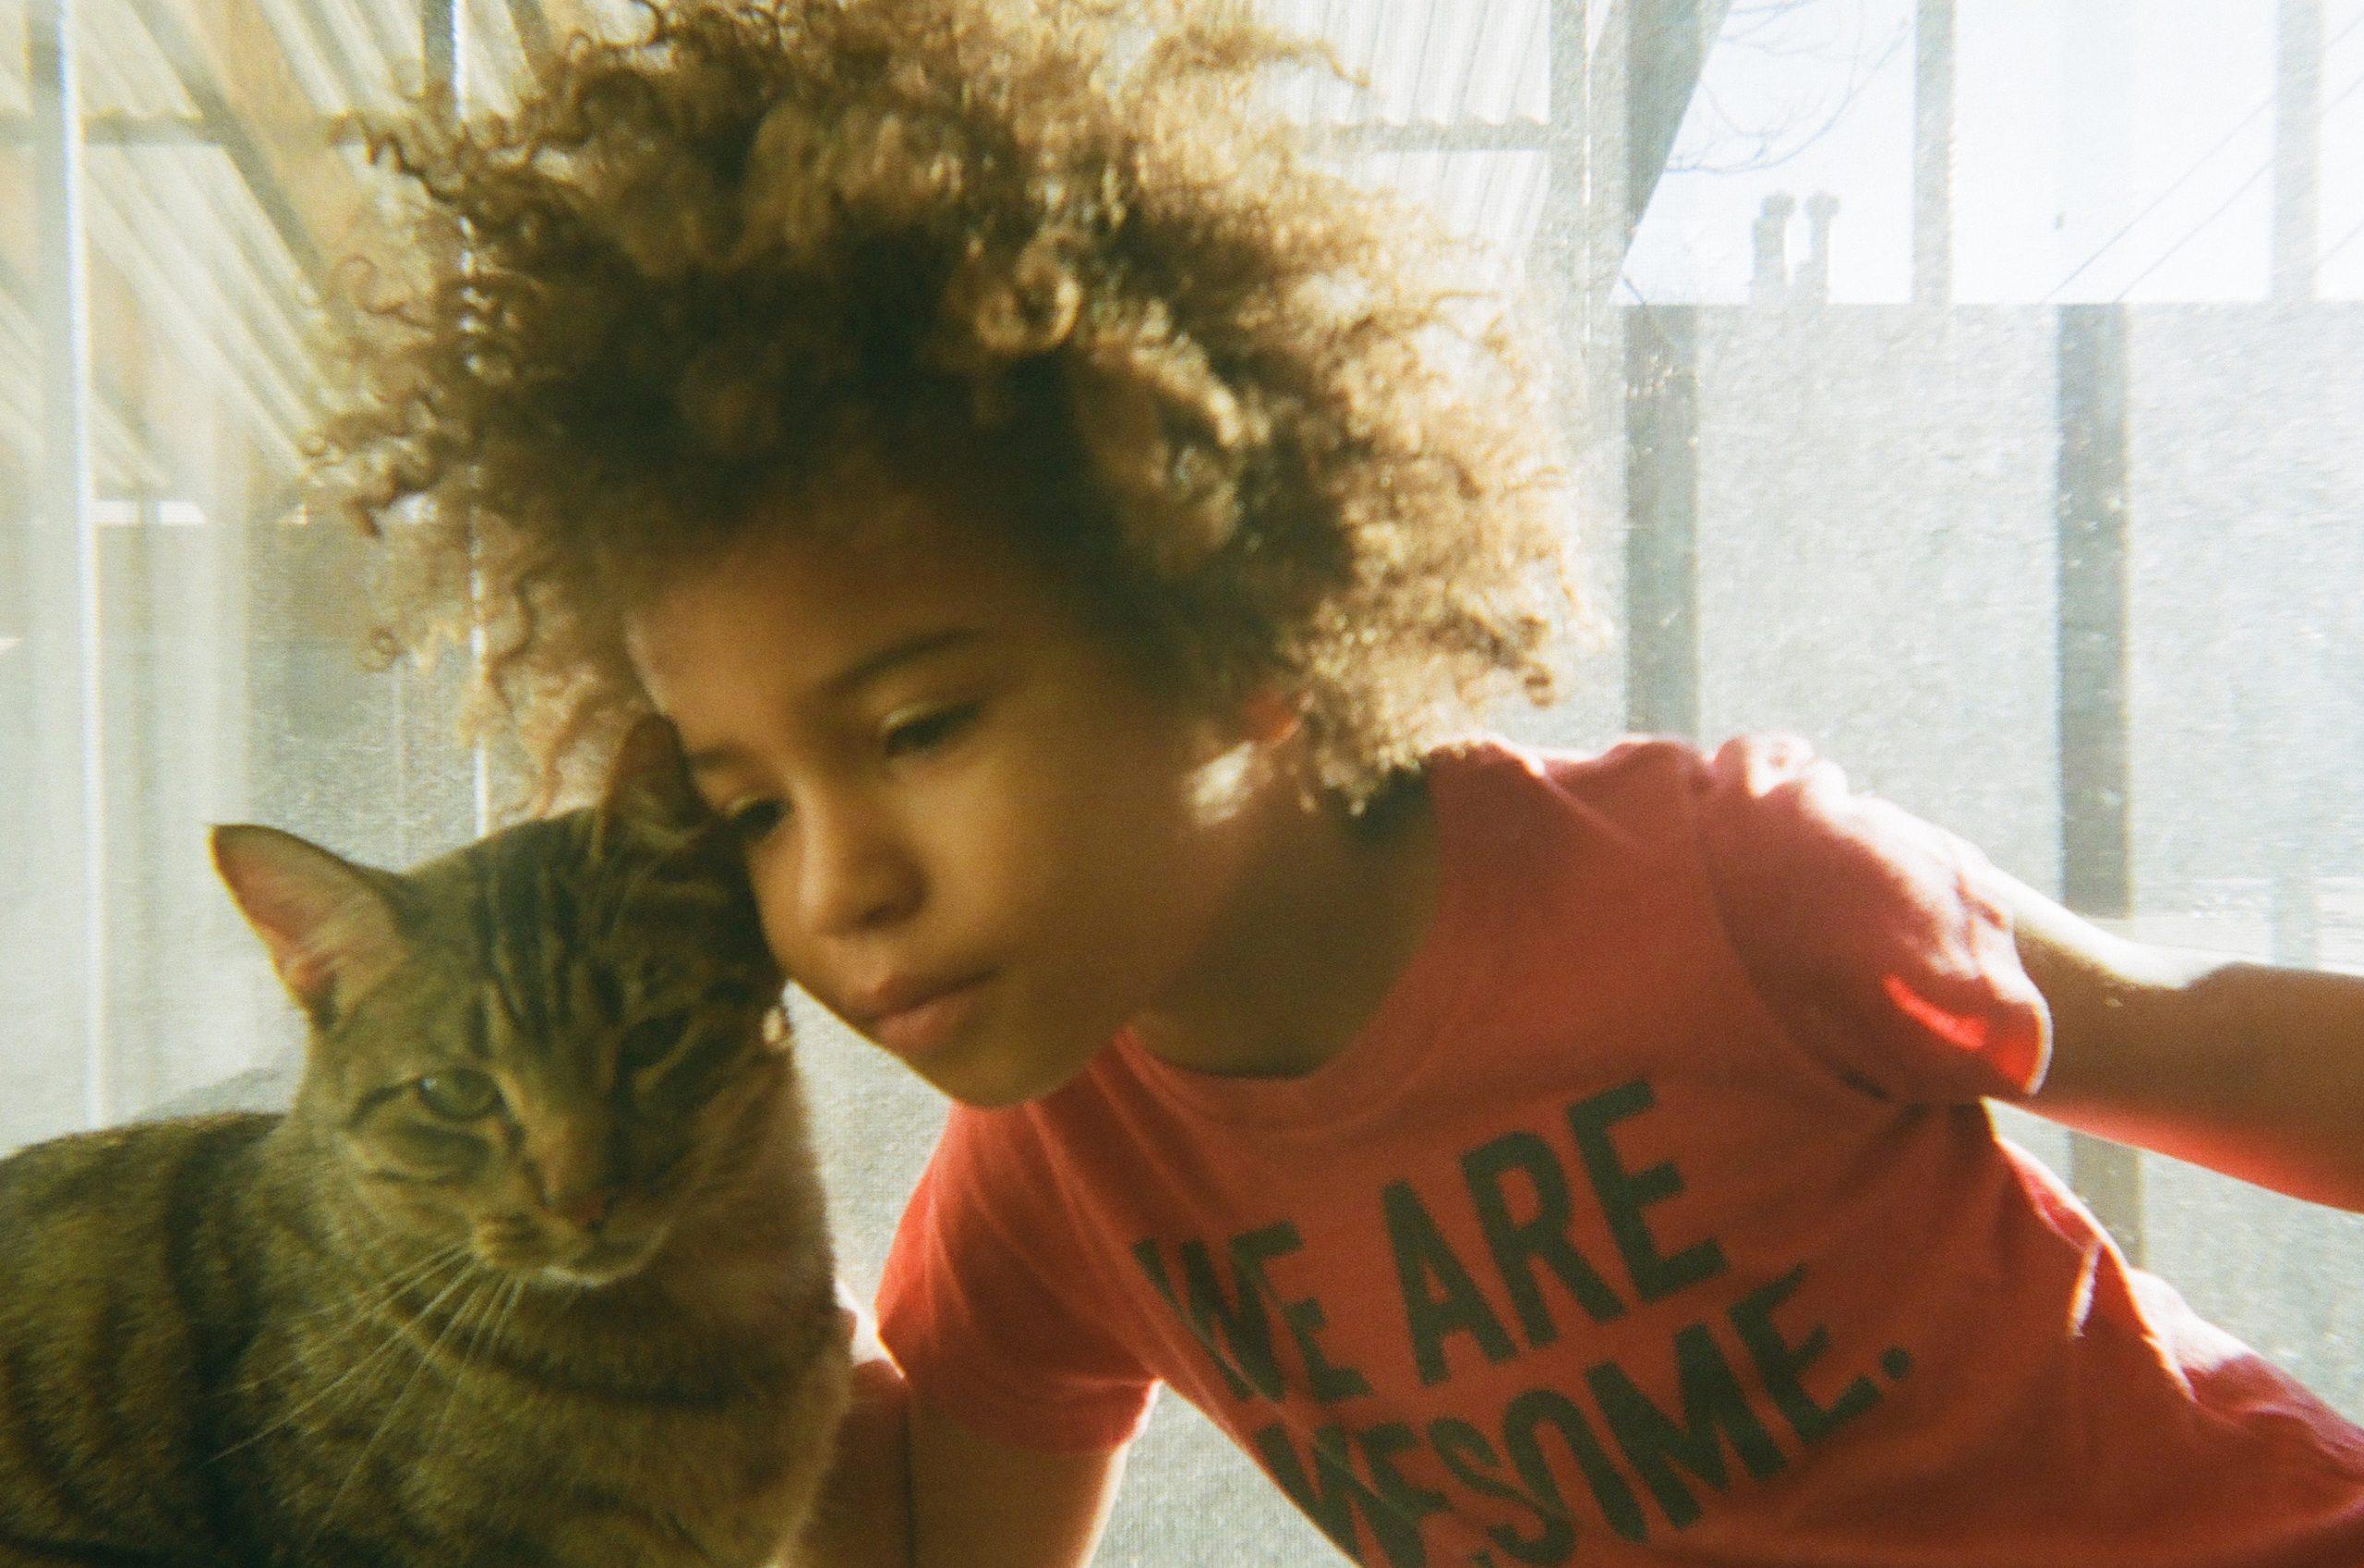 Cats As Companions During Coronavirus